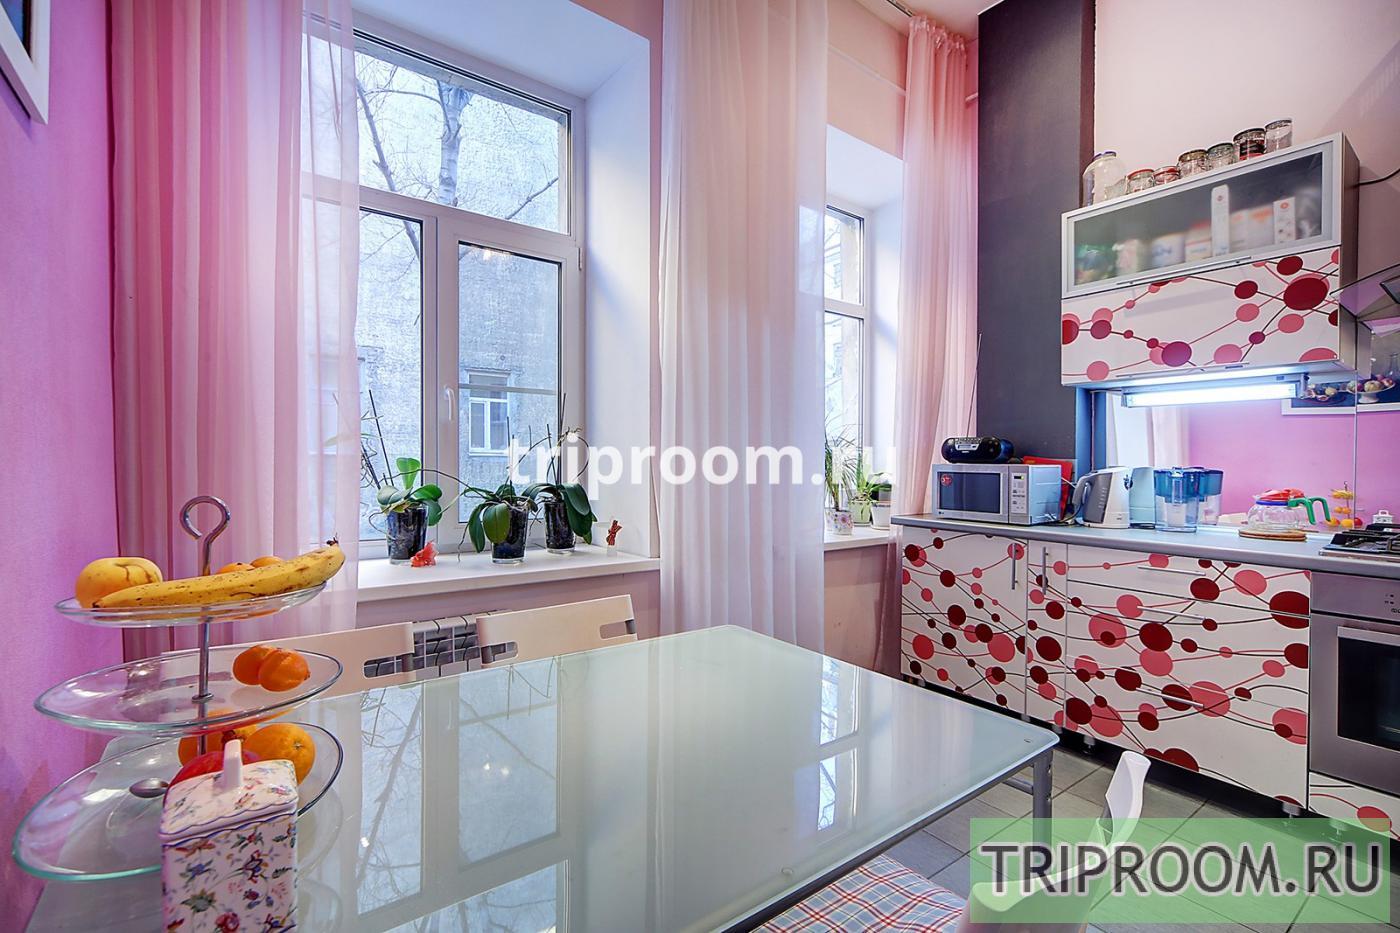 2-комнатная квартира посуточно (вариант № 15426), ул. Лиговский проспект, фото № 20